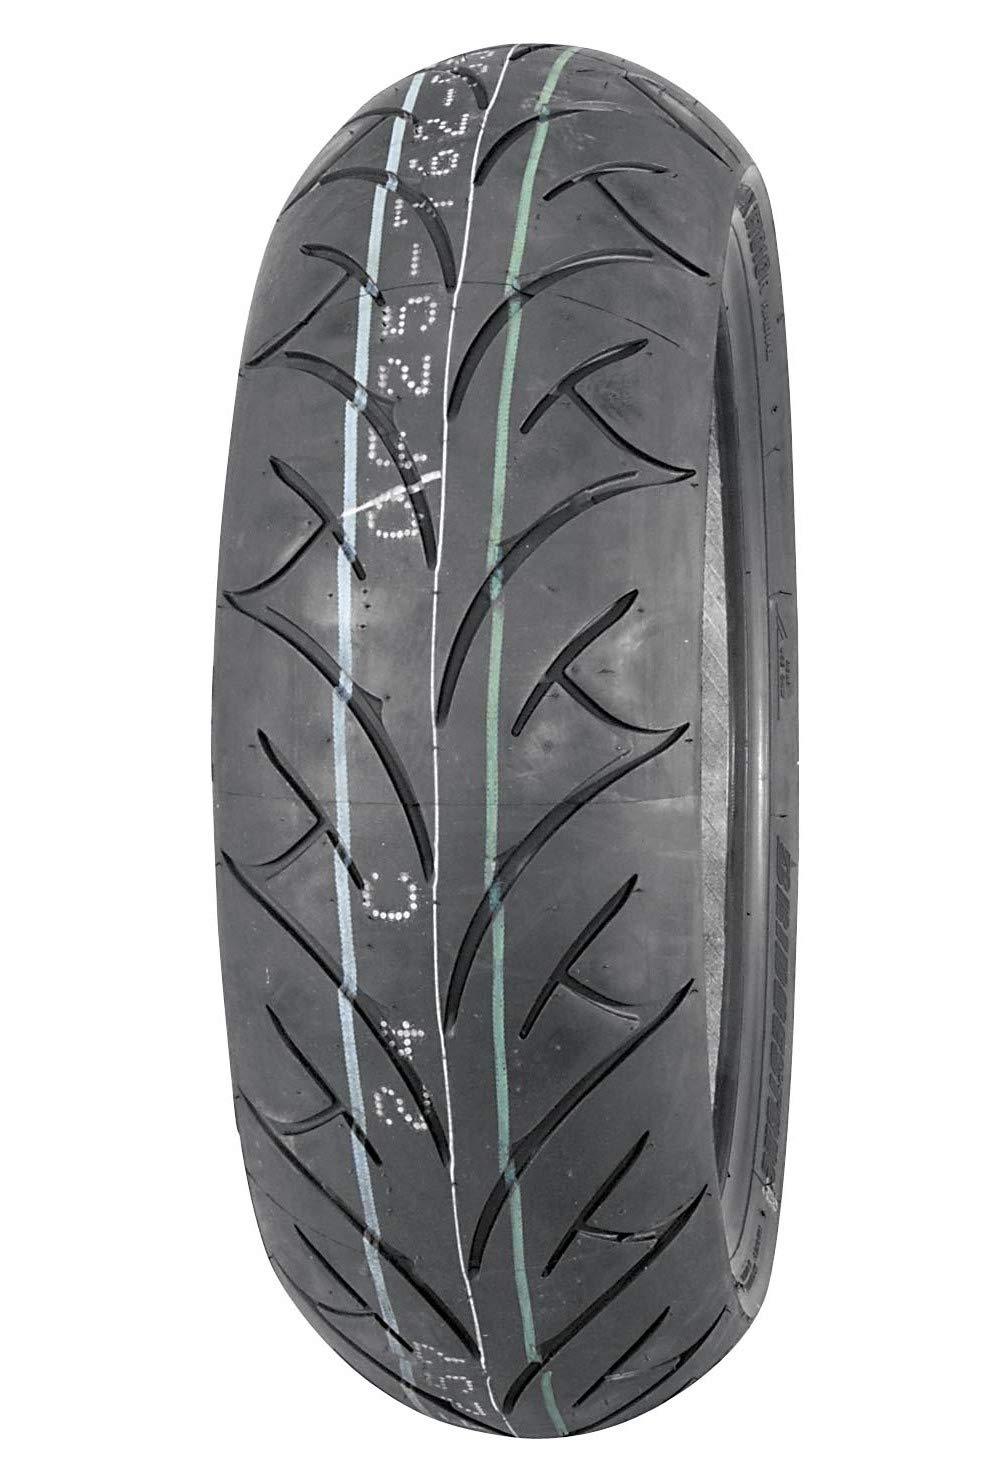 Bridgestone Exendra G508 Touring Bias Tire - 130/90-15 66P 143049